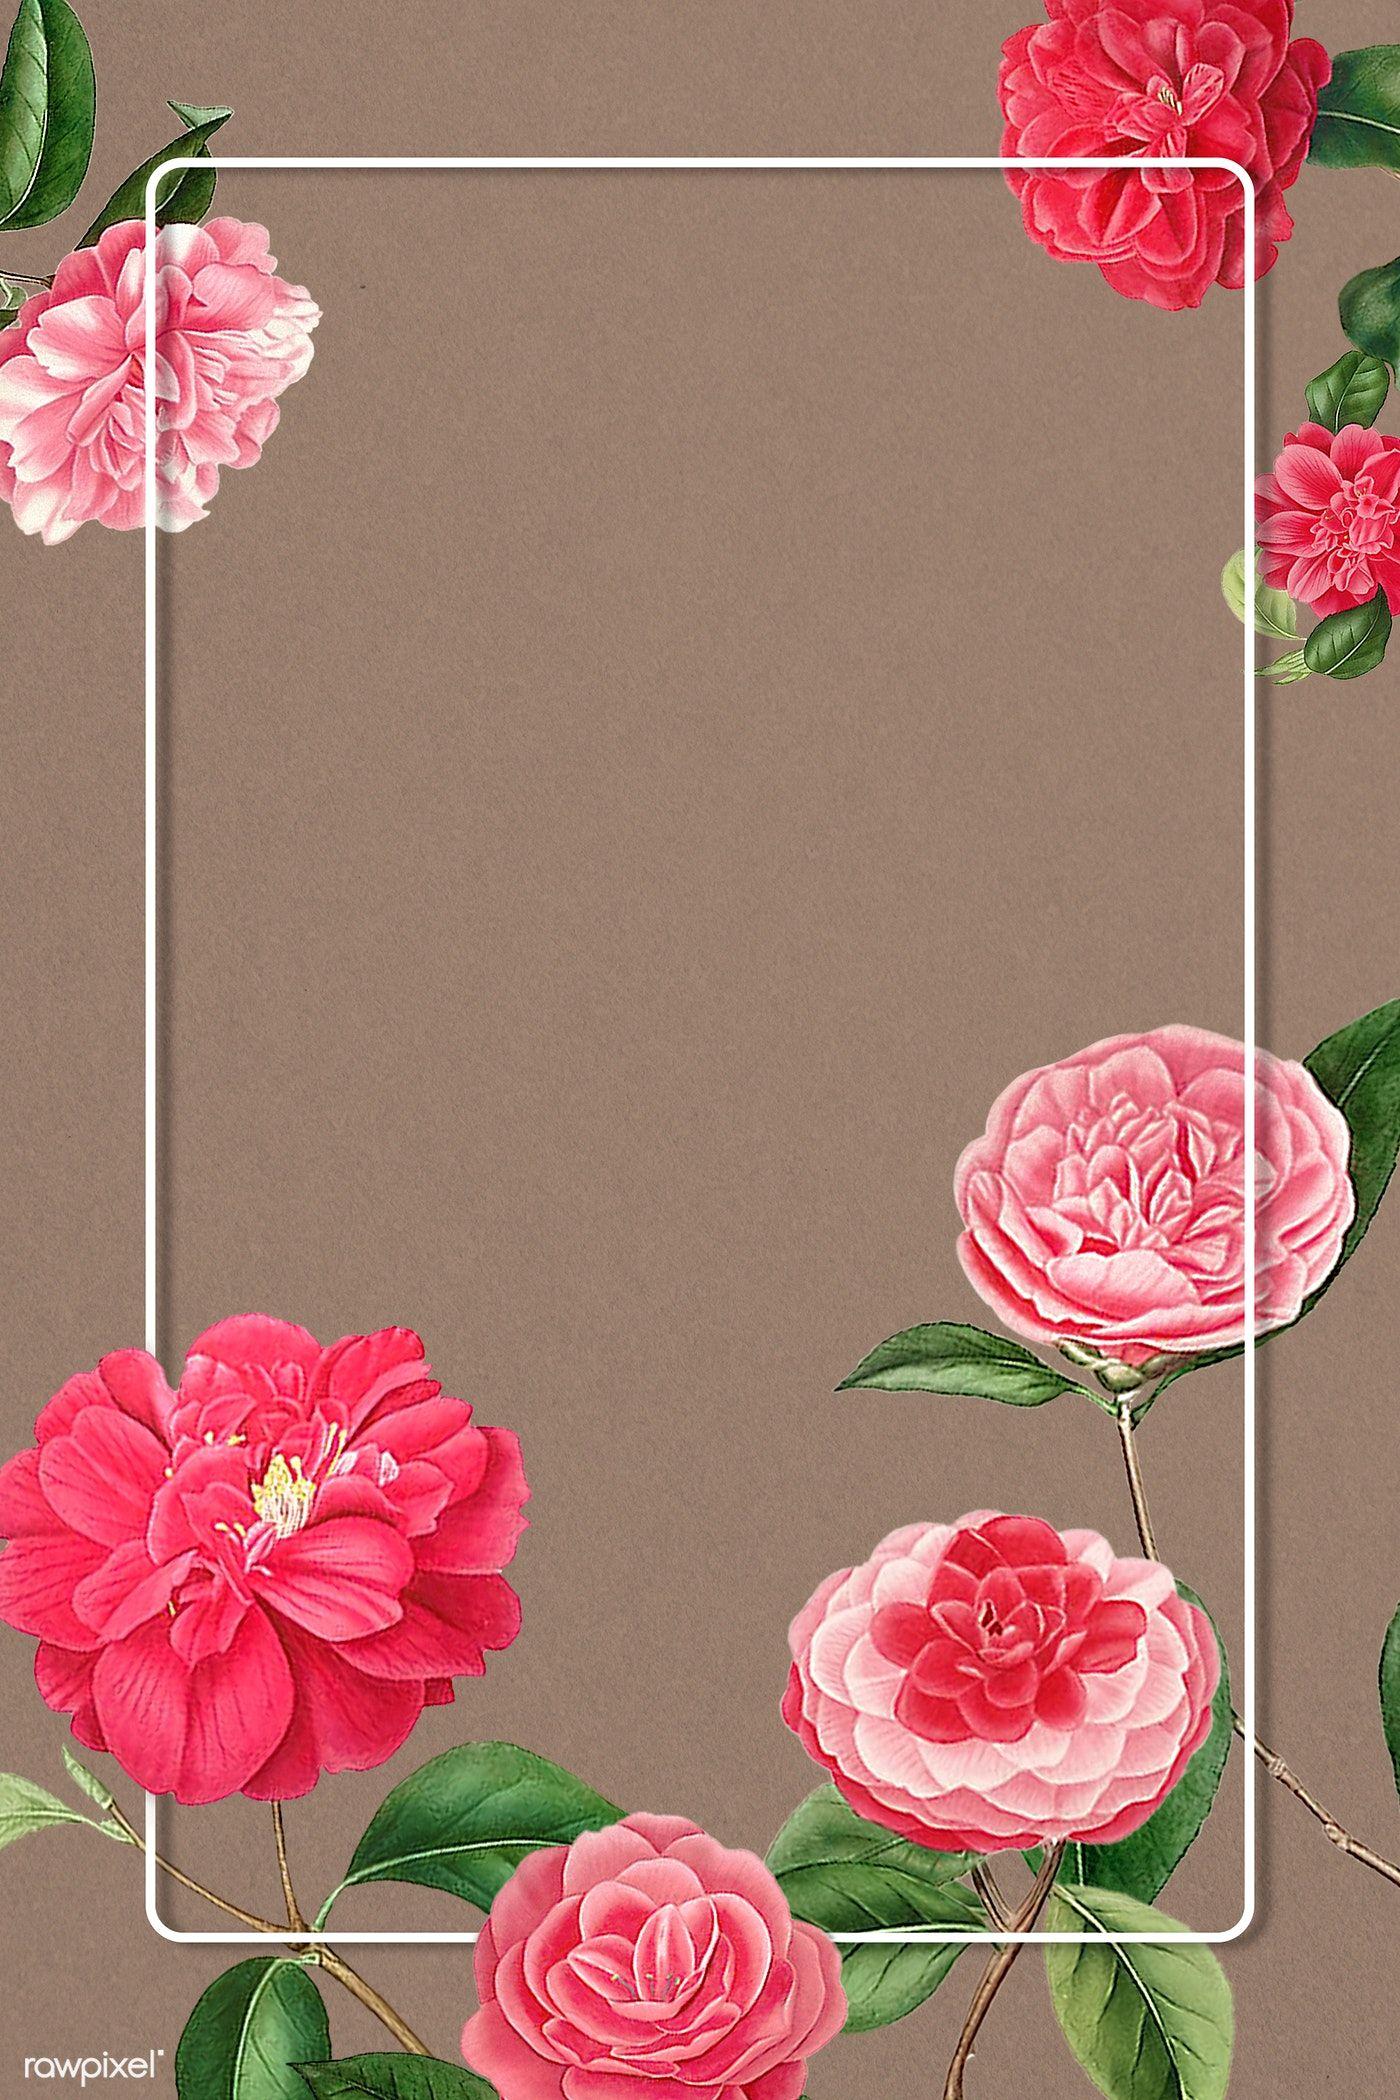 Download Premium Psd Of Red And Pink Camellia Flower Patterned Blank Frame In 2020 Flower Illustration Flower Wallpaper Flower Frame